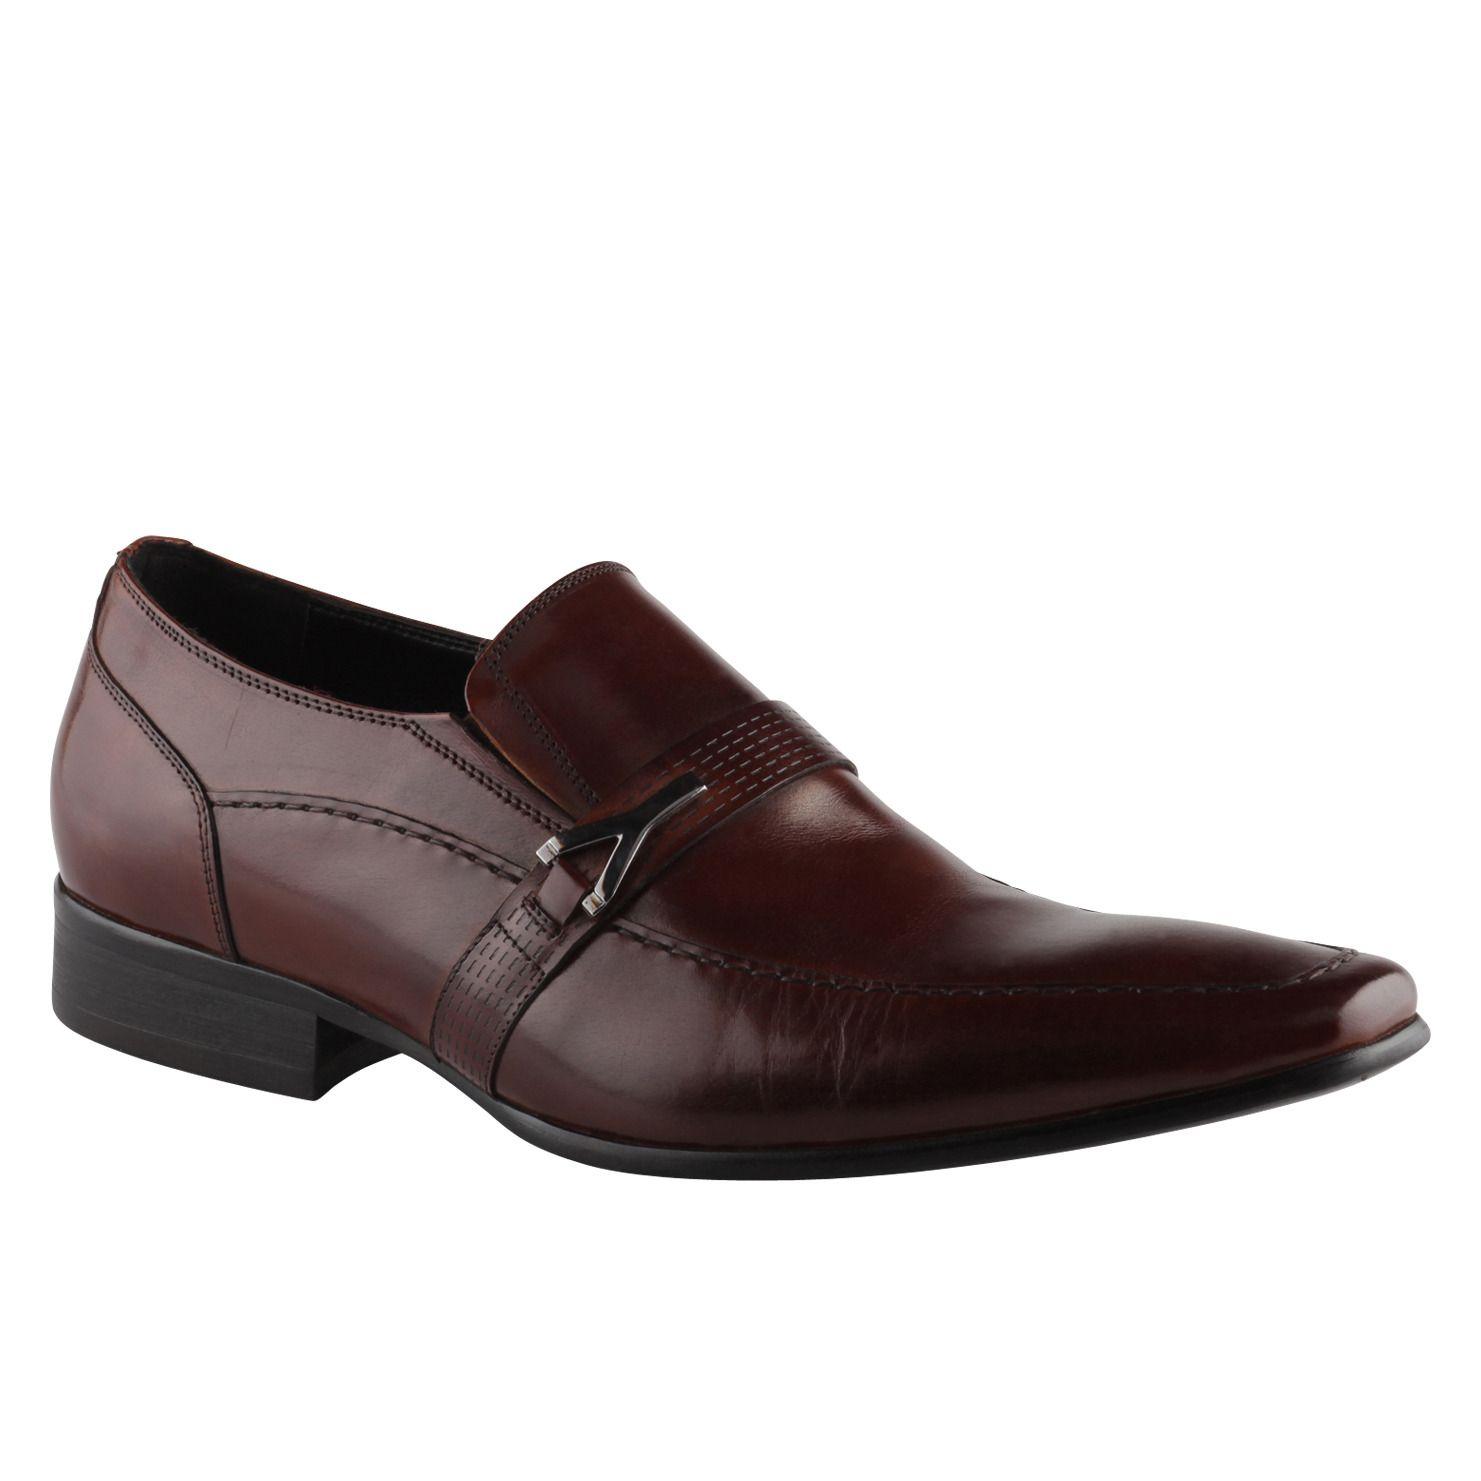 Aldo shoes · YEOHAM - men's dress loafers ...